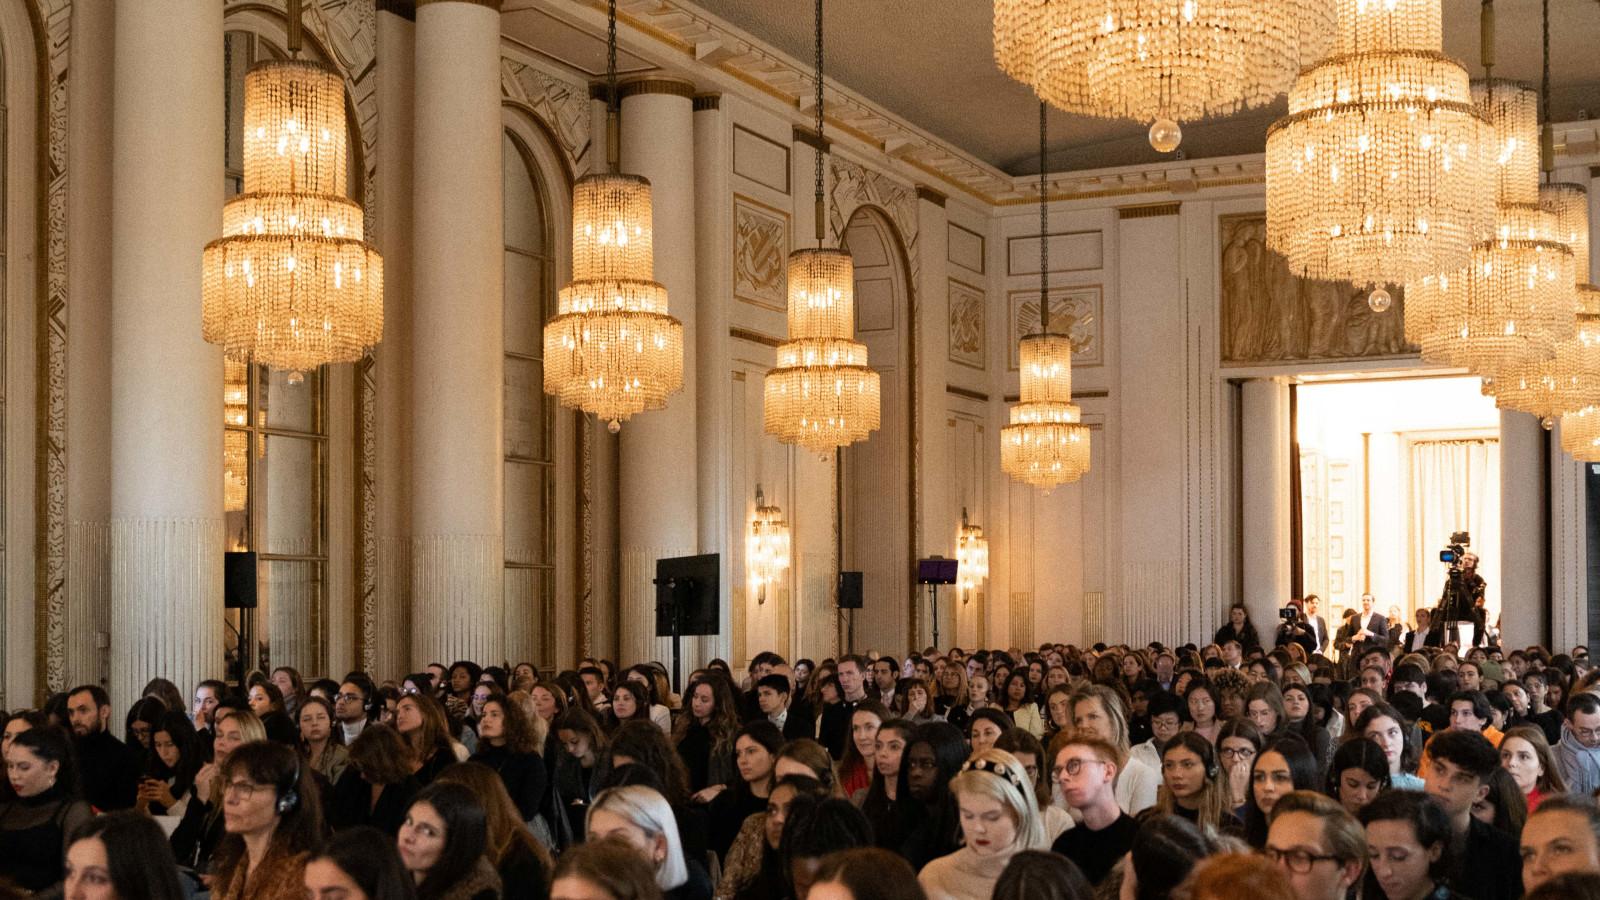 Vogue Fashion Festival 2019 DSC 0590 - Stéphanie LEFEBVRE - France - Vogue Fashion Festival - 5